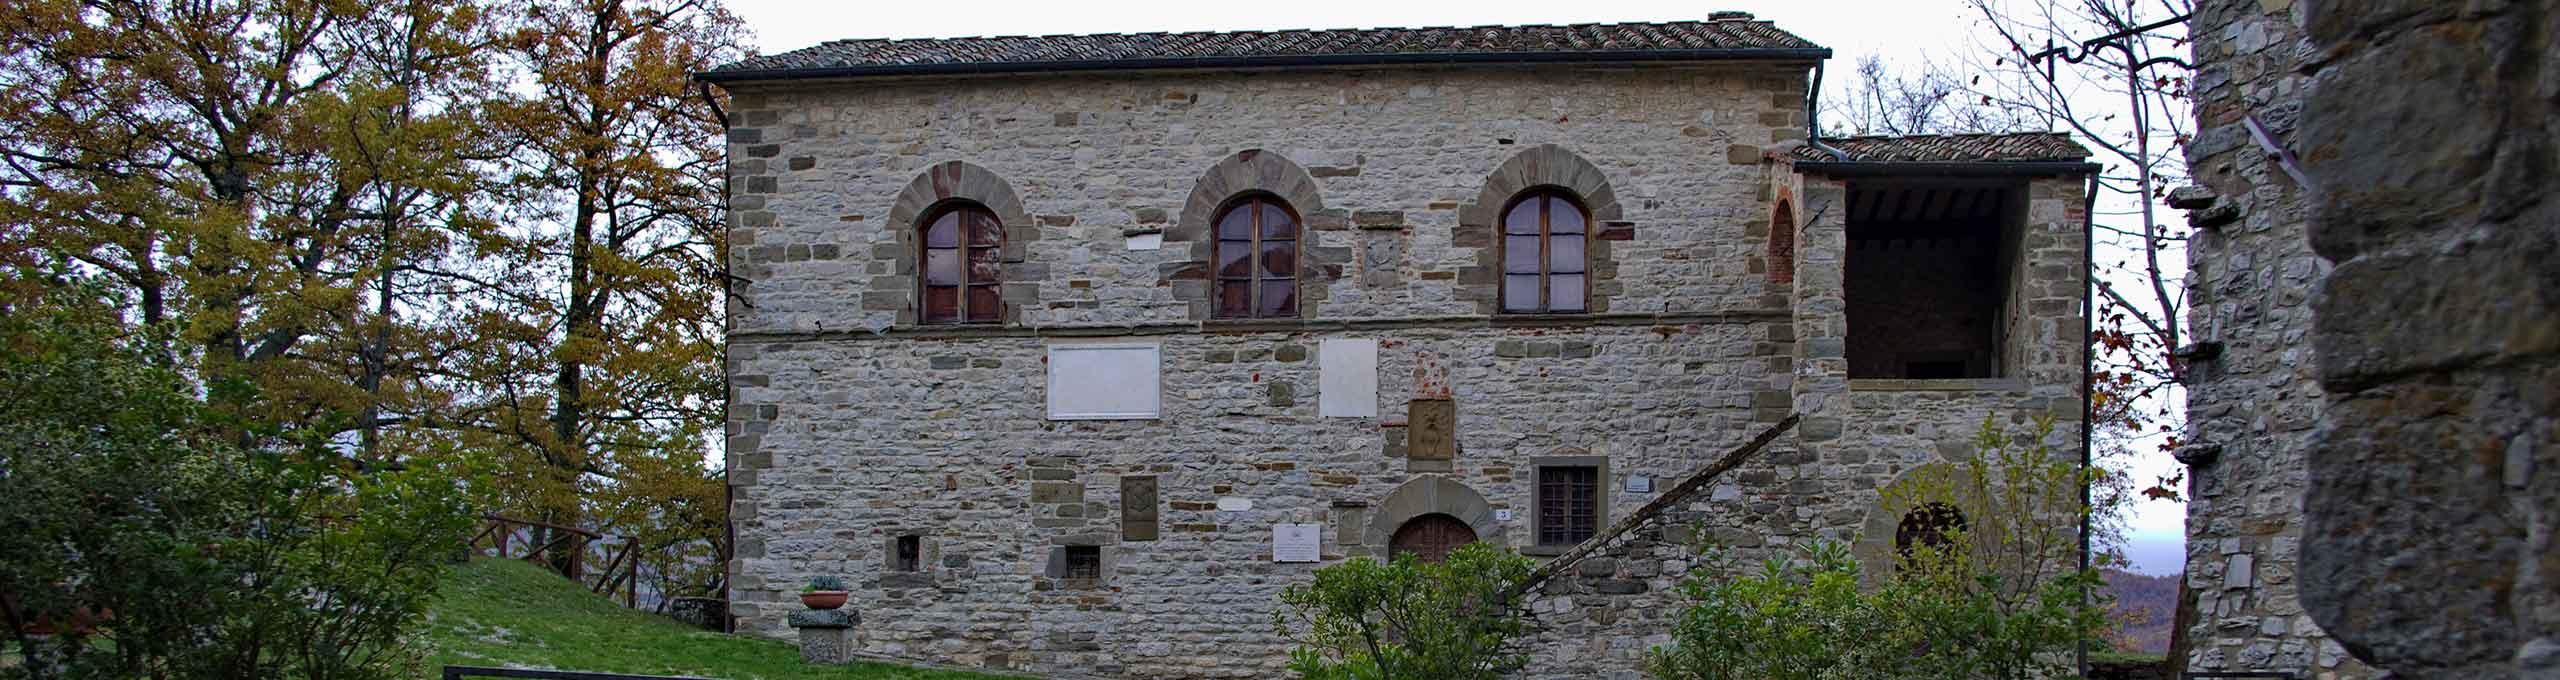 Paese natale di Michelangelo Buonarroti